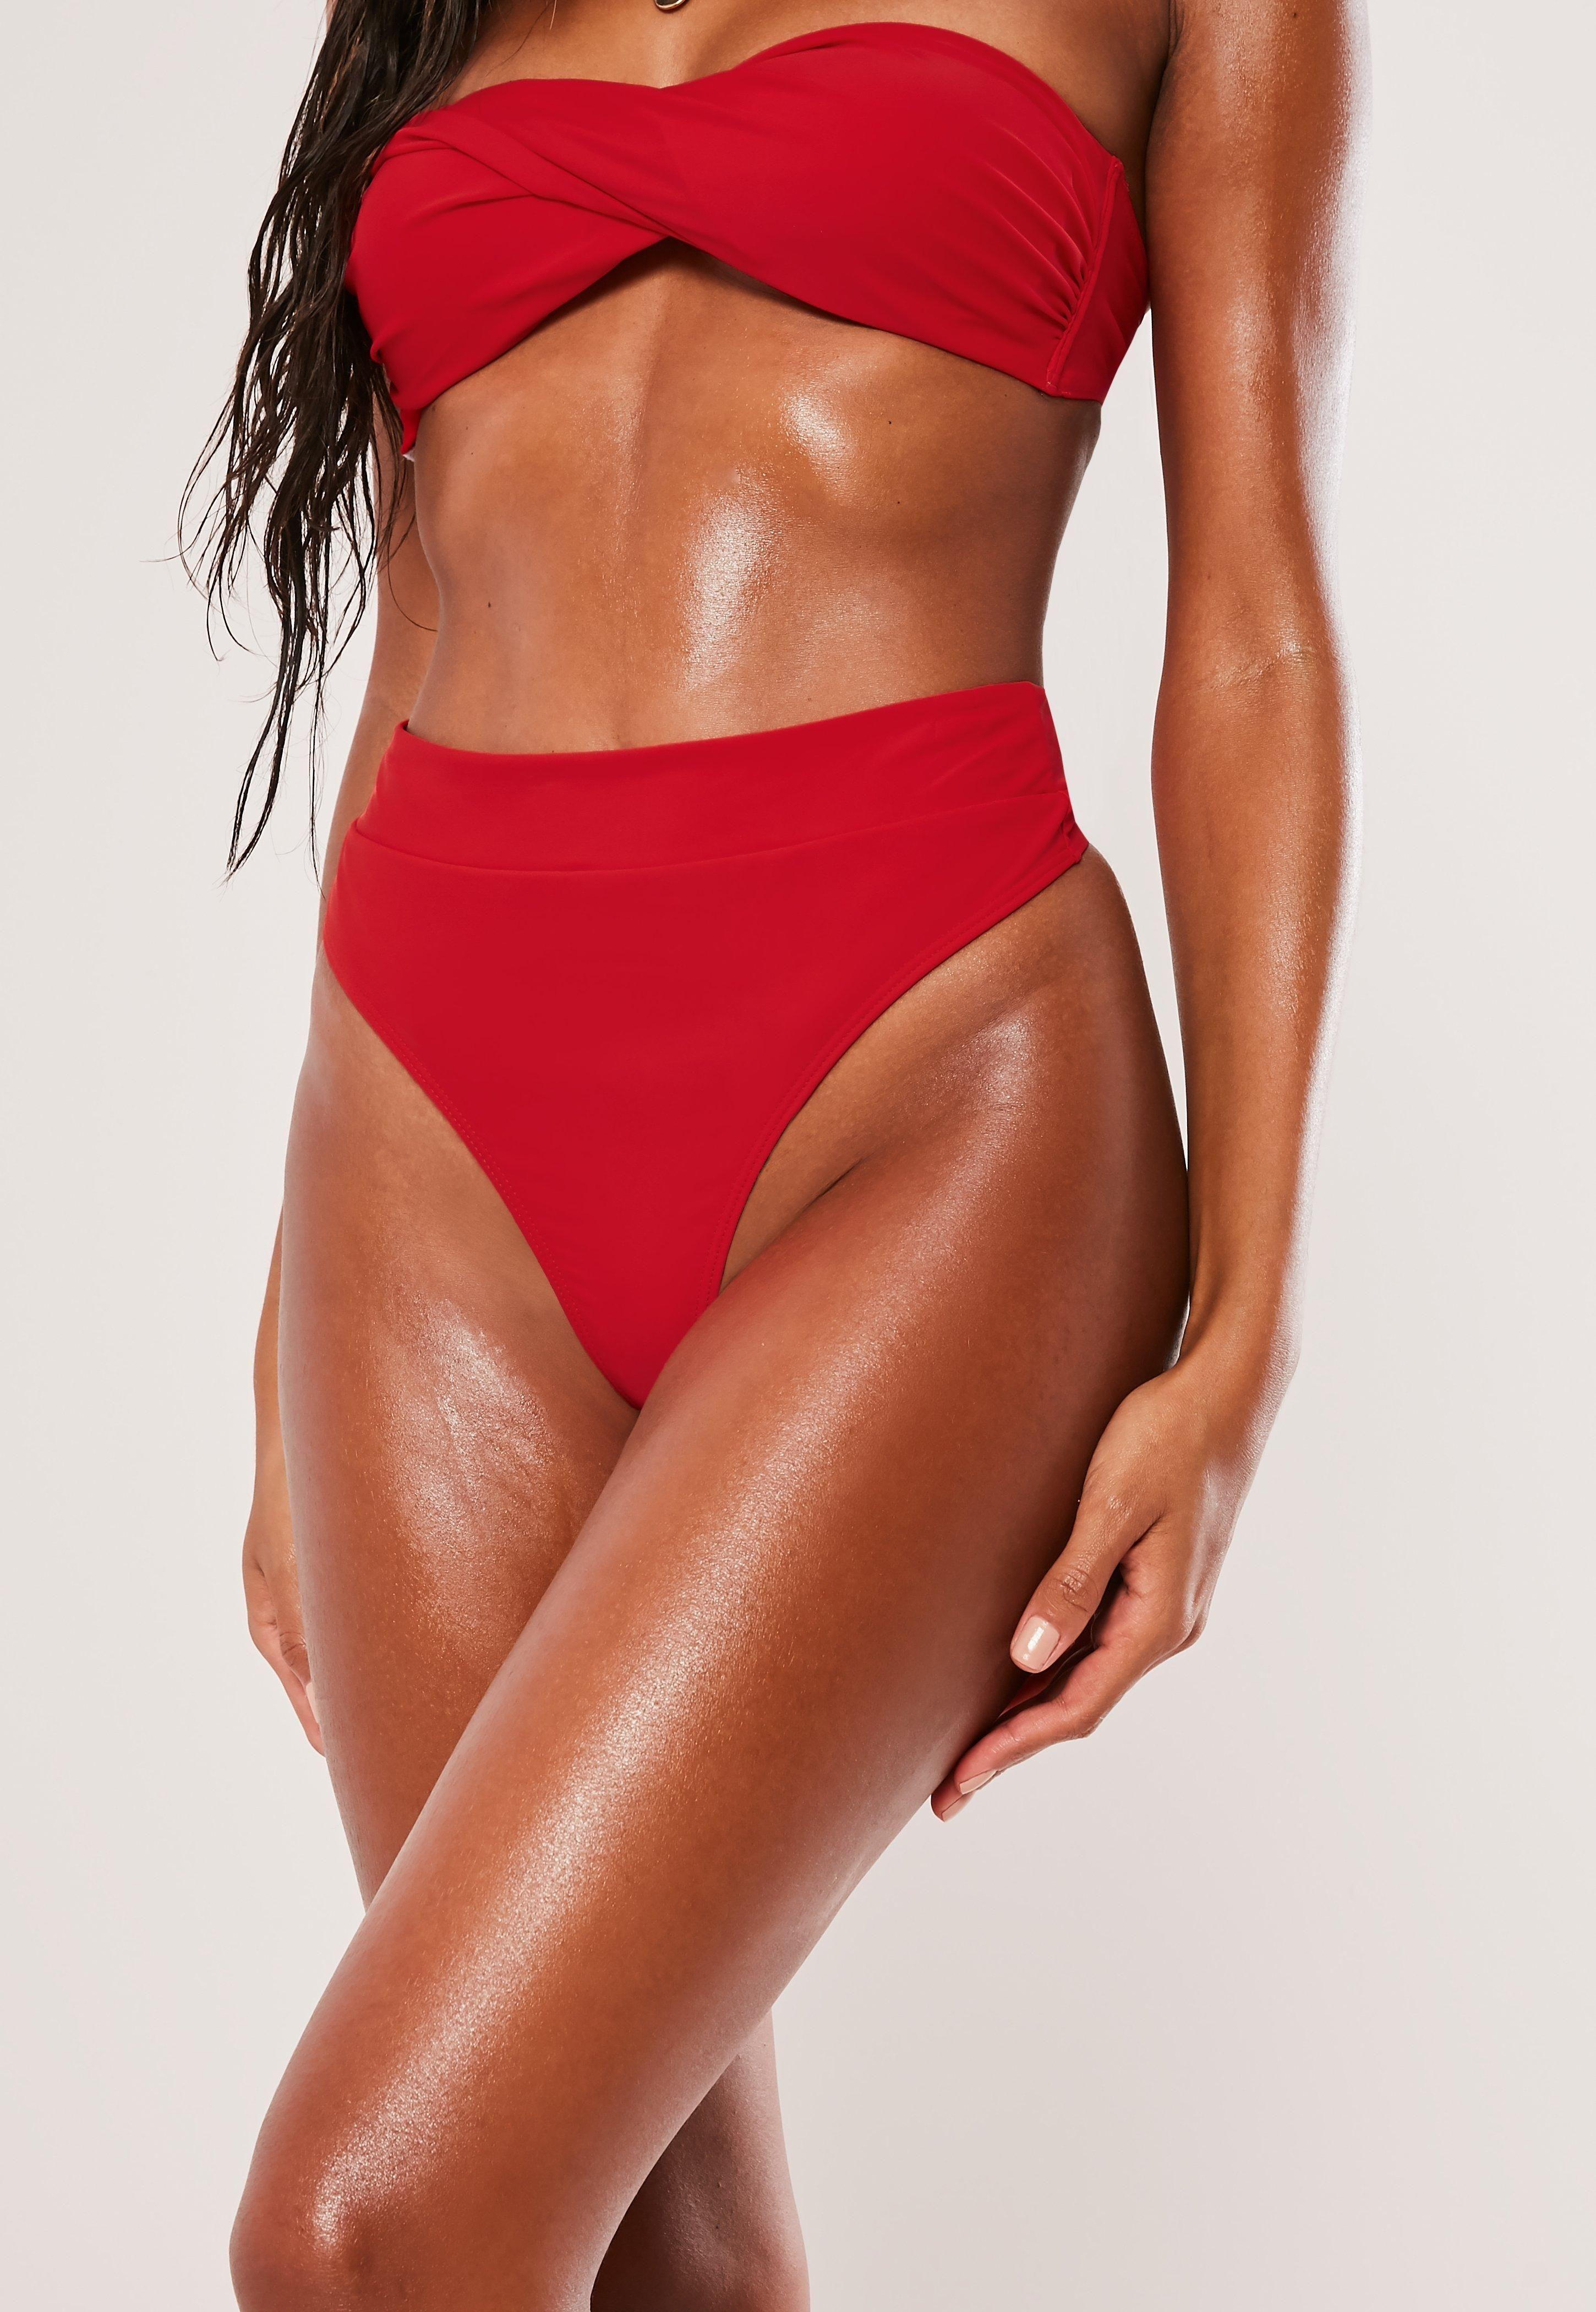 bc5b23638d9 Red Mix And Match High Waisted Thong Bikini Bottoms  Sponsored  Match